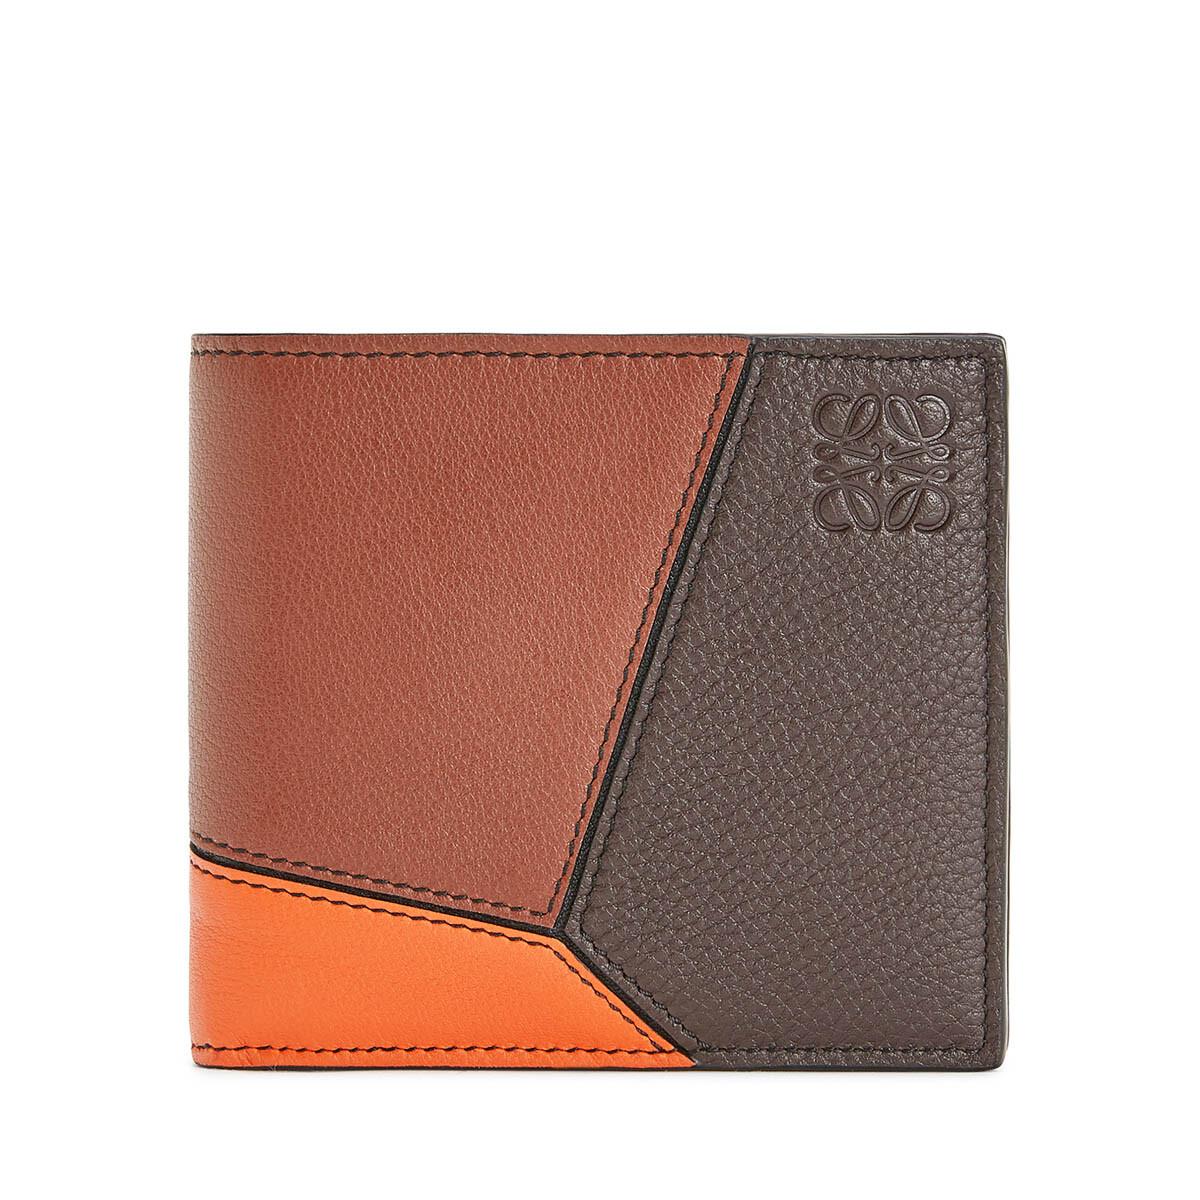 LOEWE Puzzle Bifold/Coin Wallet Cognac/Chocolate Brown front